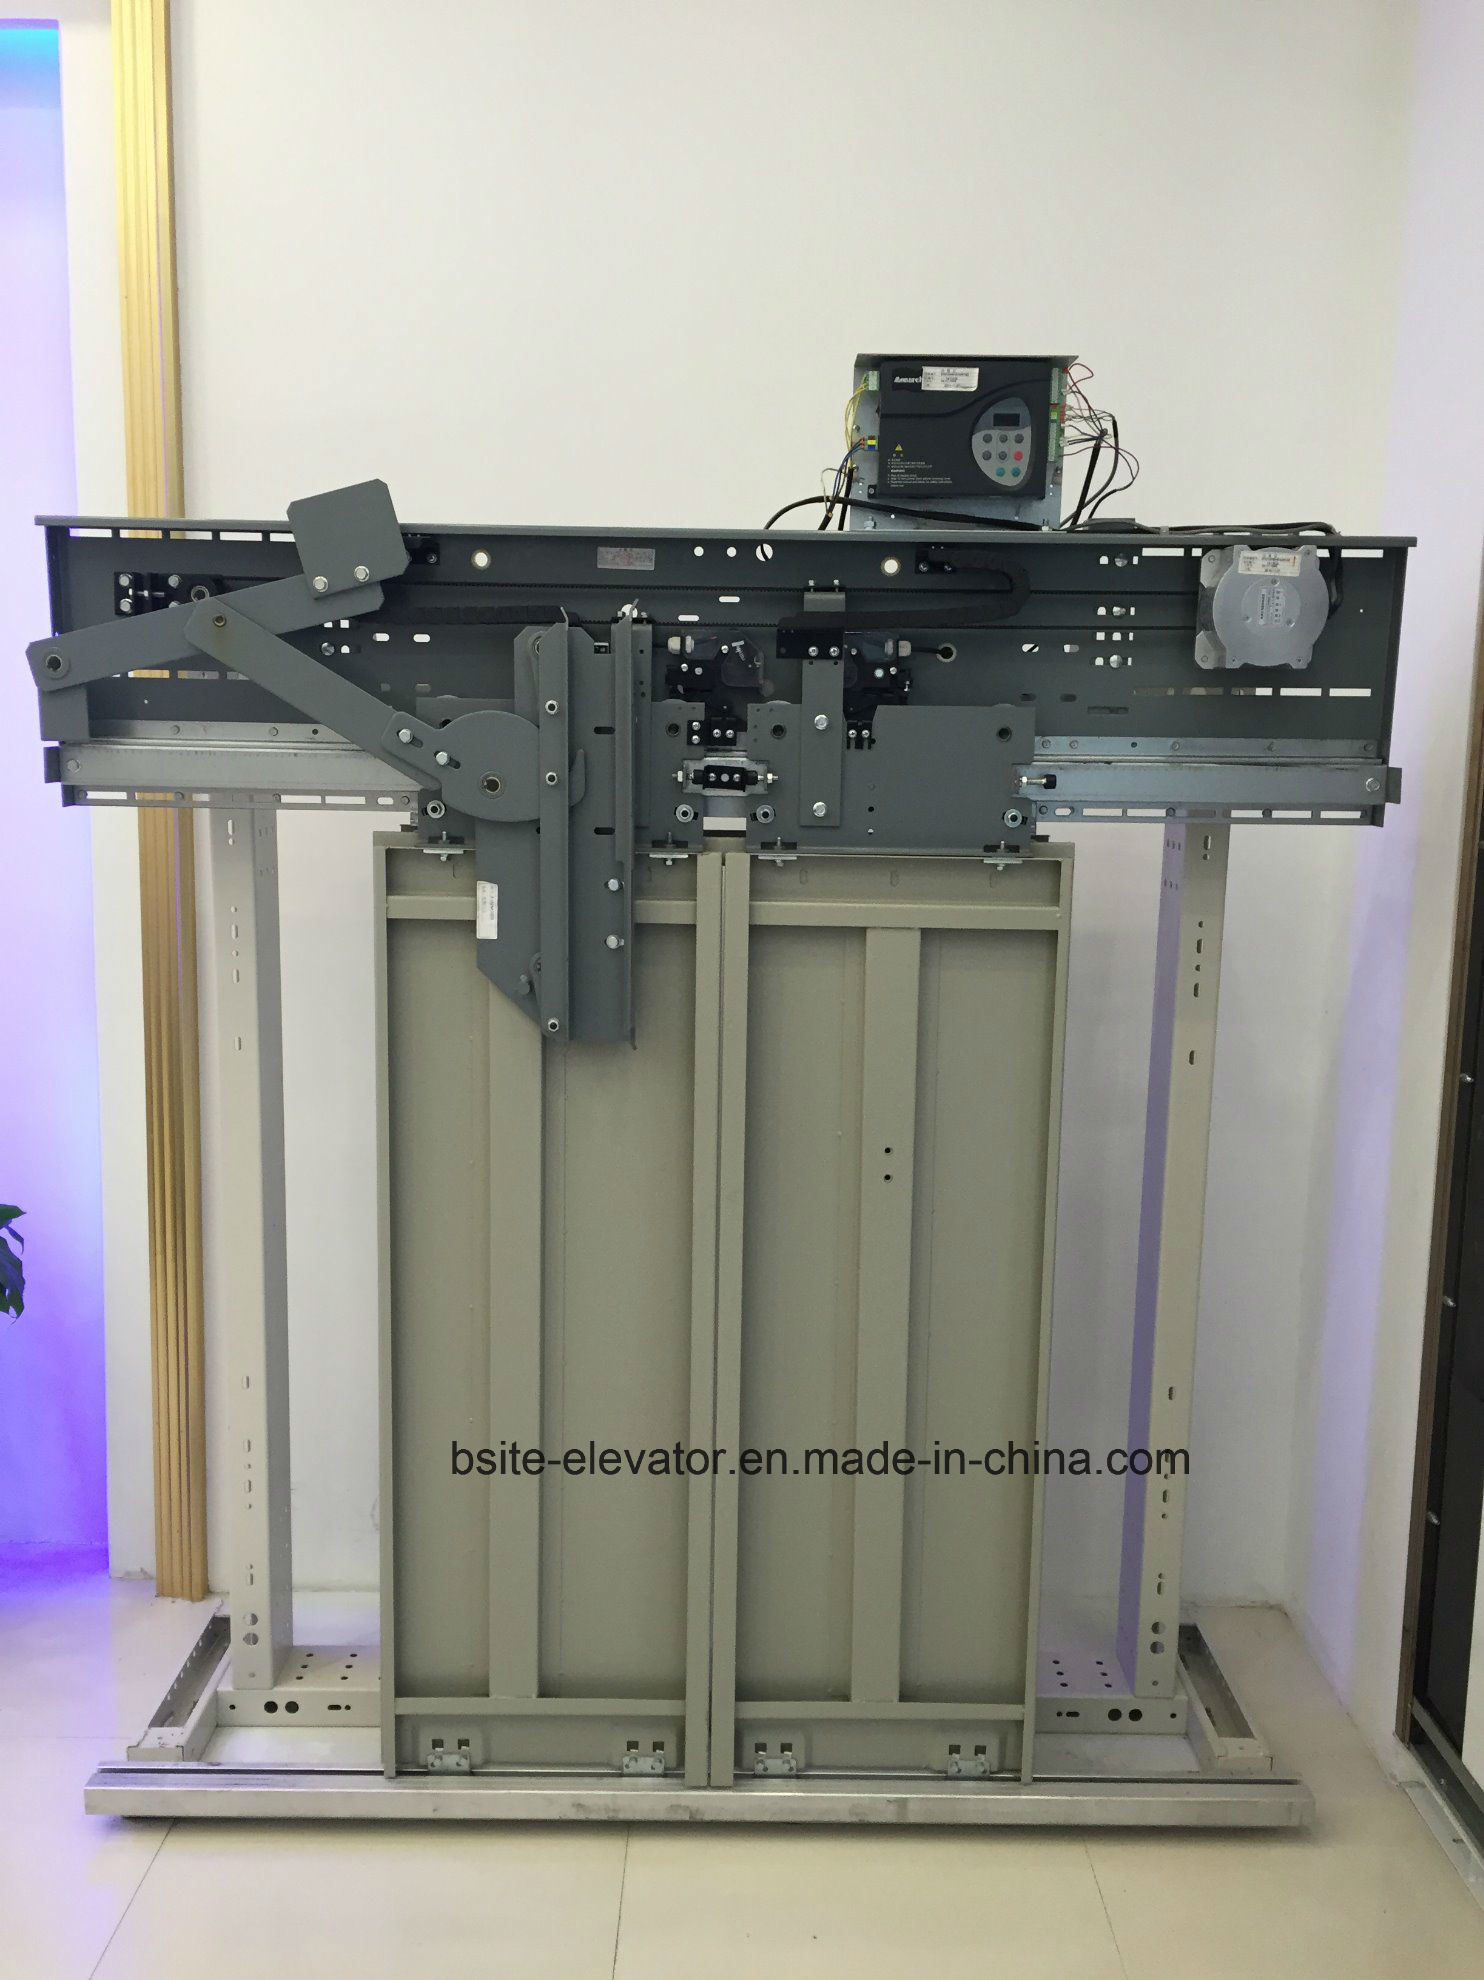 Machine Roomless Passenger Elevator Home Lift